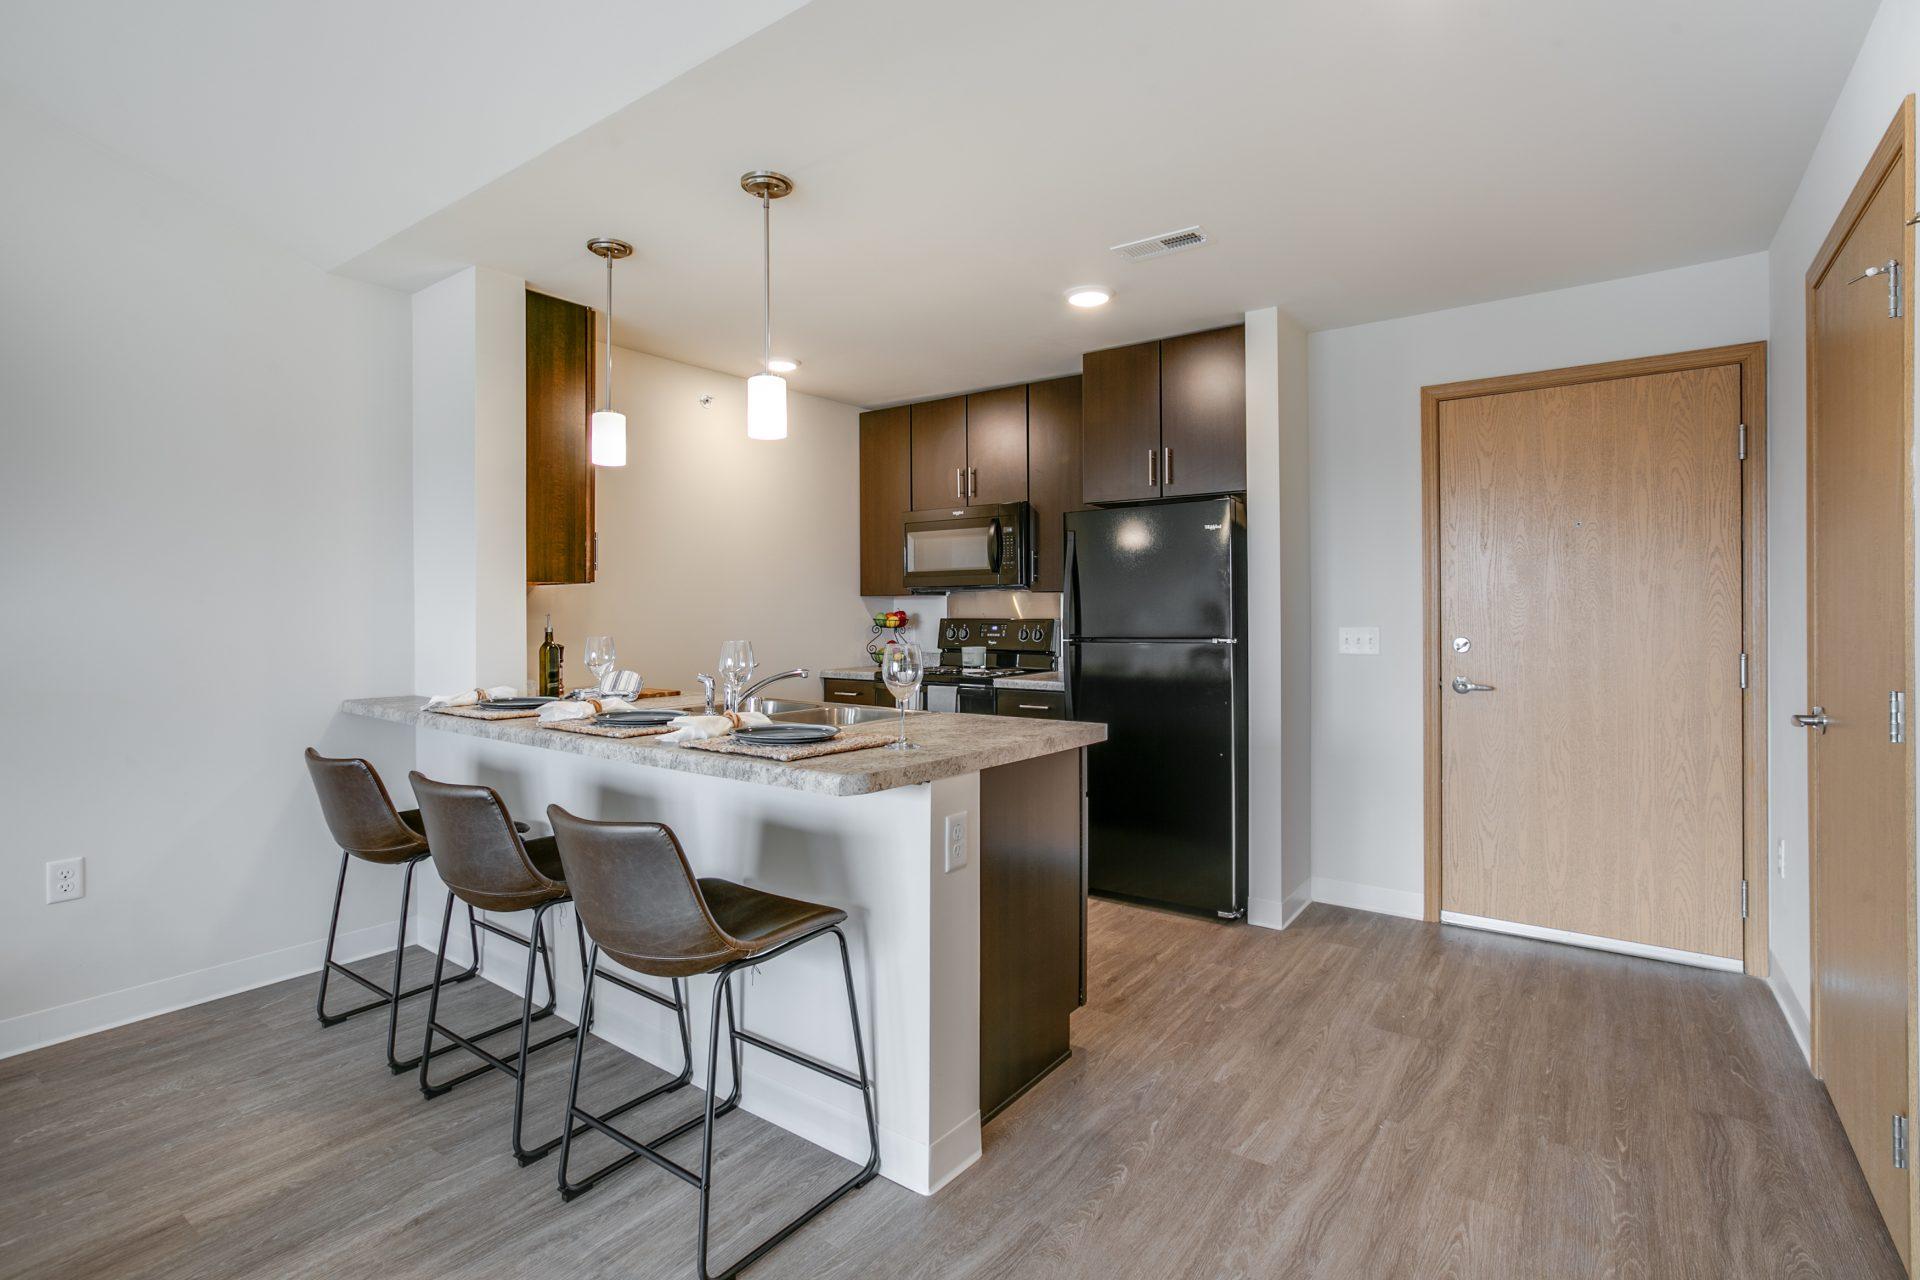 Senior apartments for rent, rent in Salem WI, Senior apartments in Salem WI